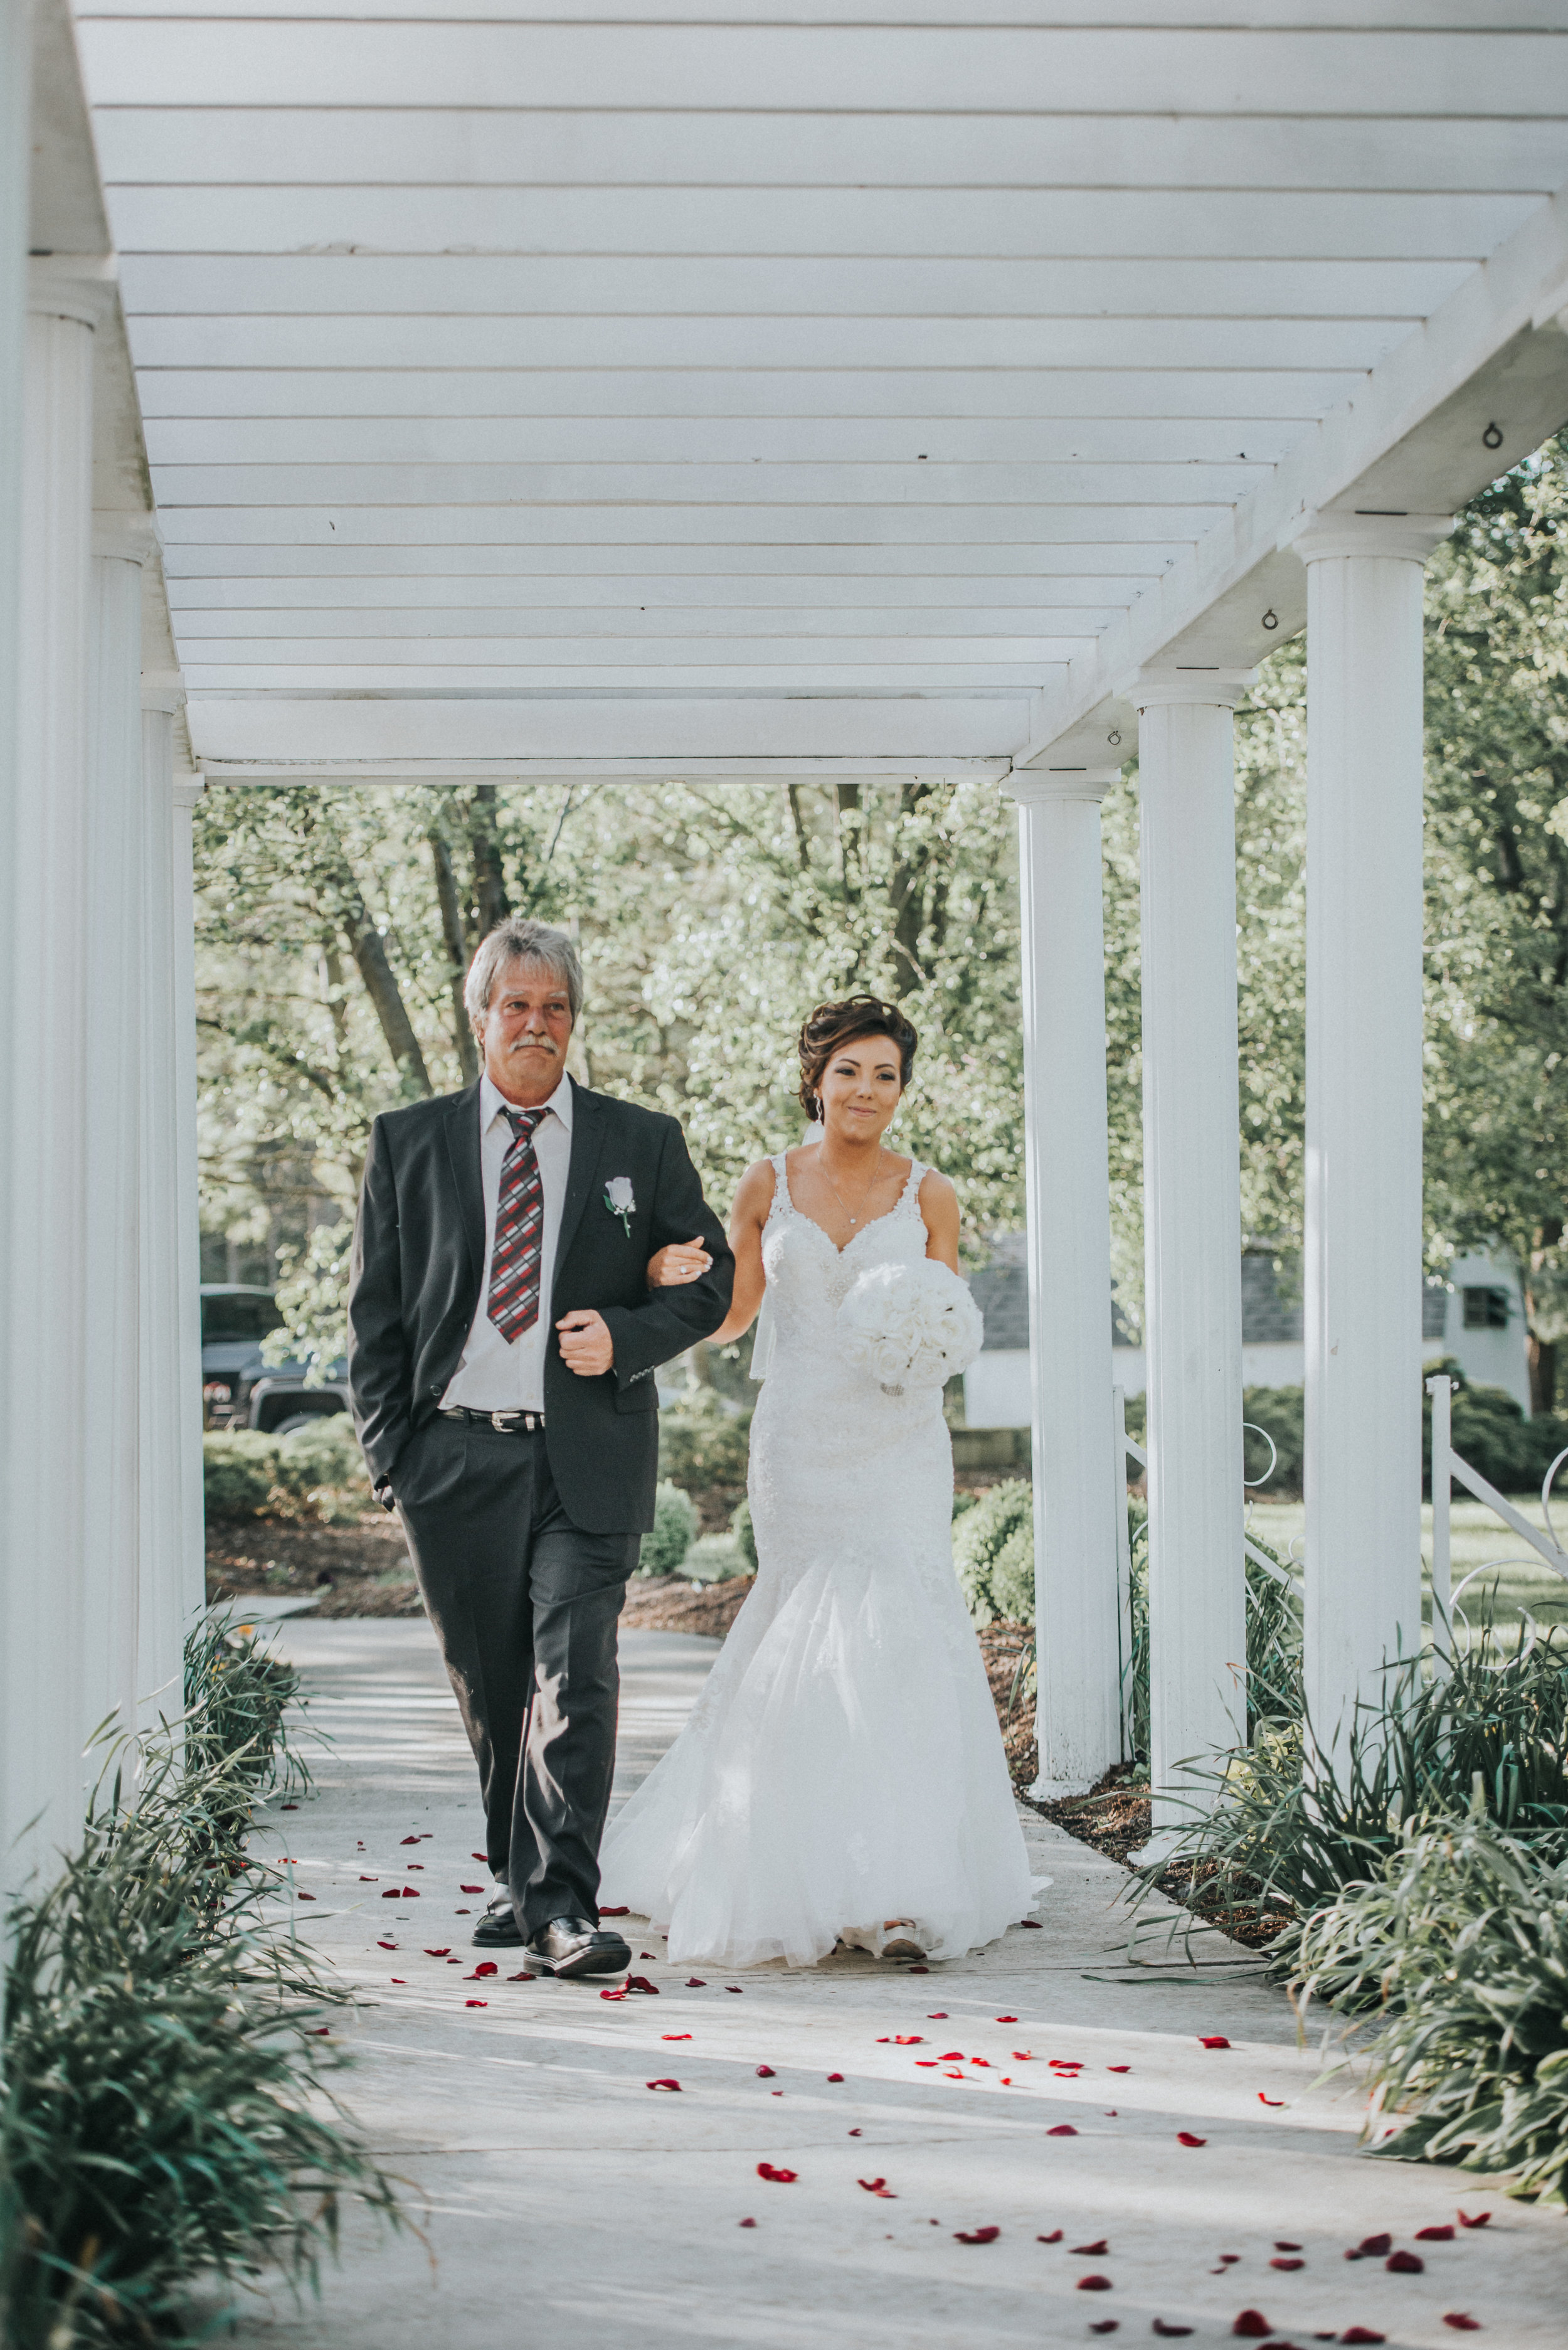 Christina-and-Gene-Wedding-Marla-Rain-Photography-318.jpg